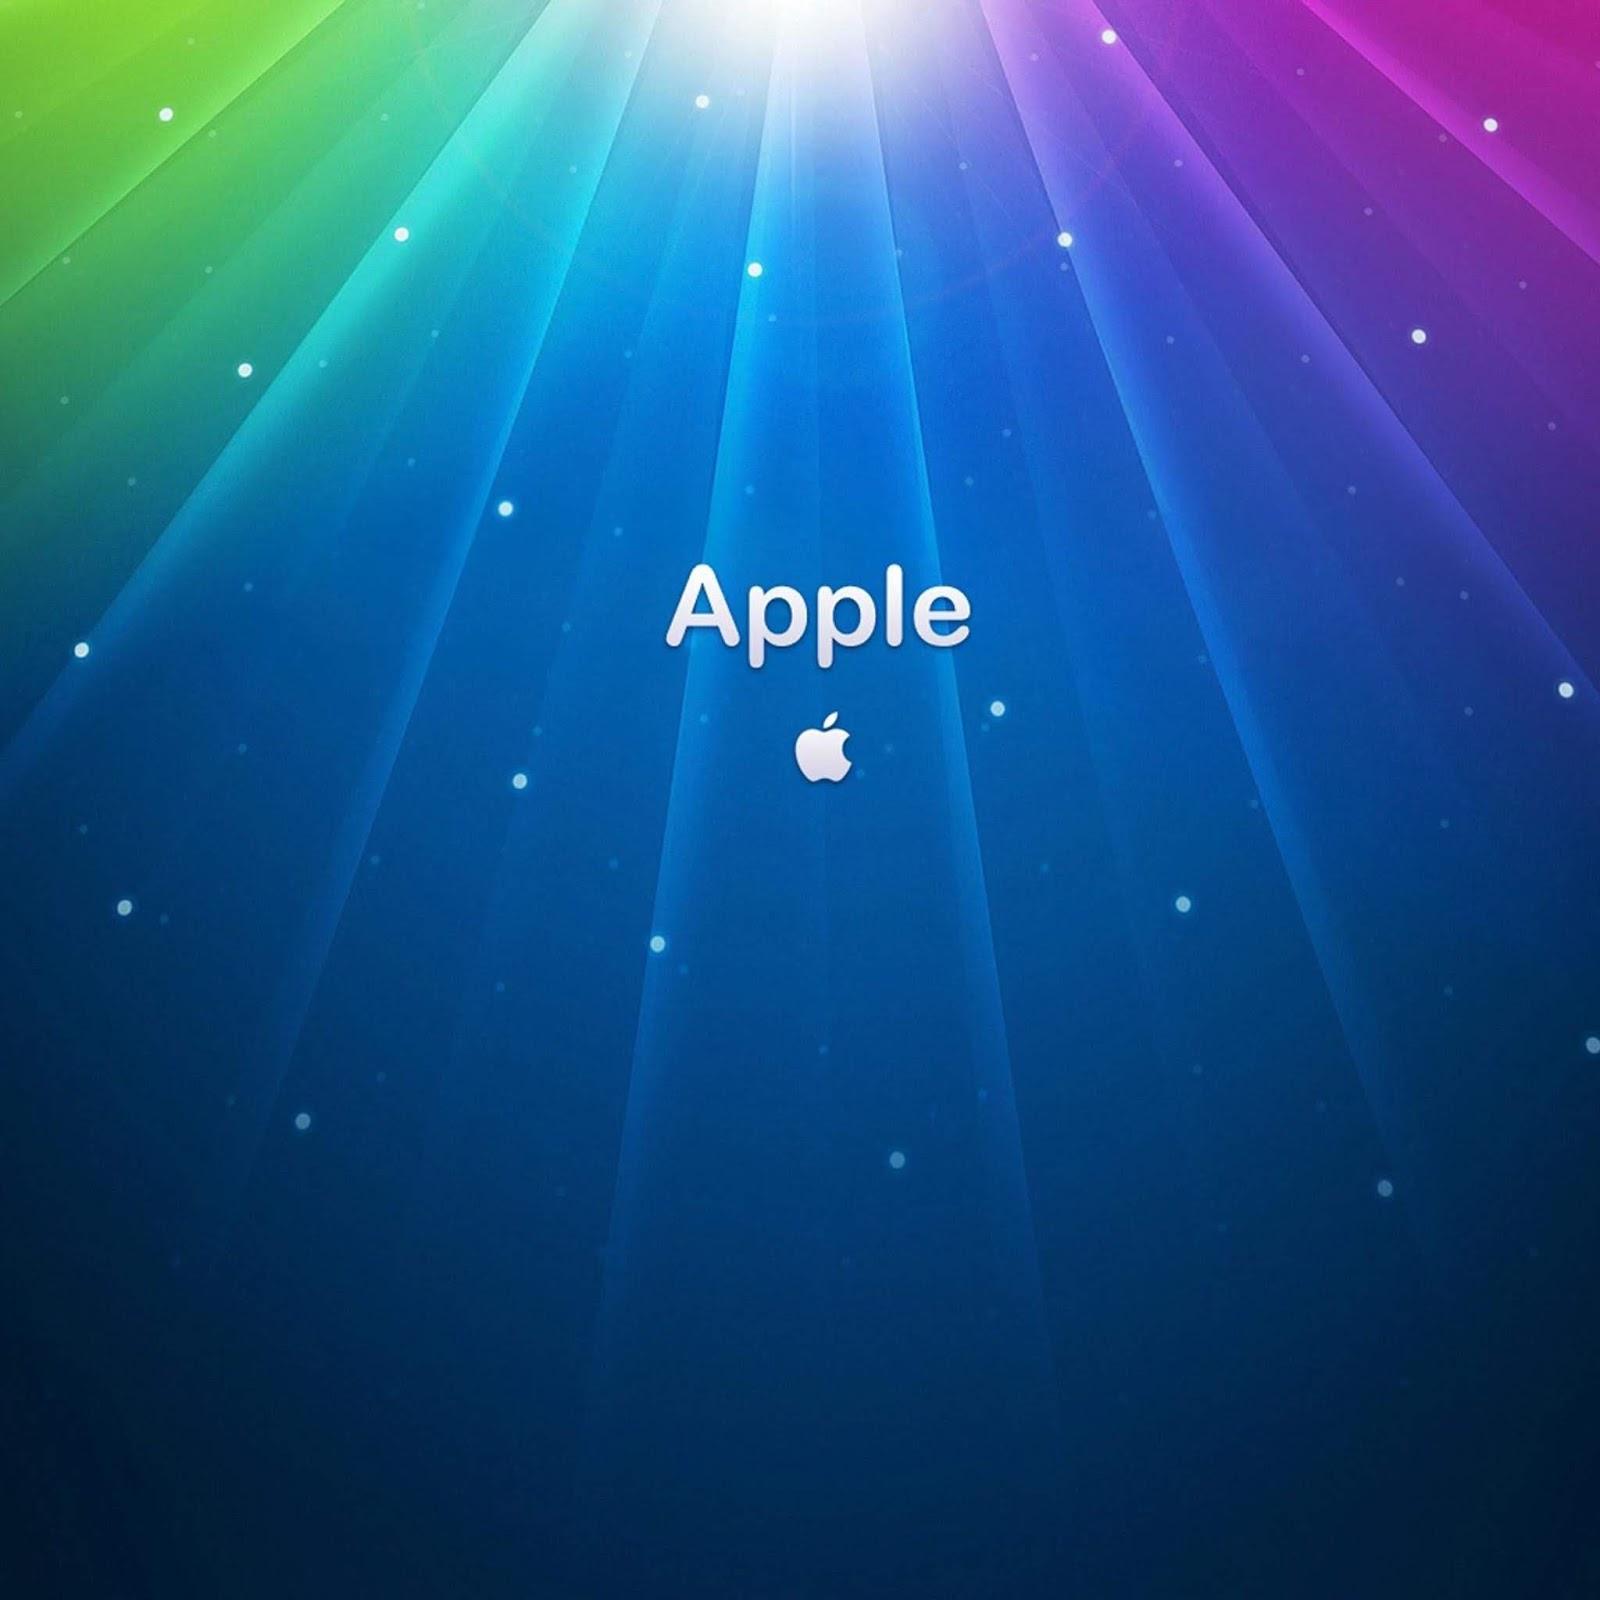 Apple iPad Pro Wallpapers